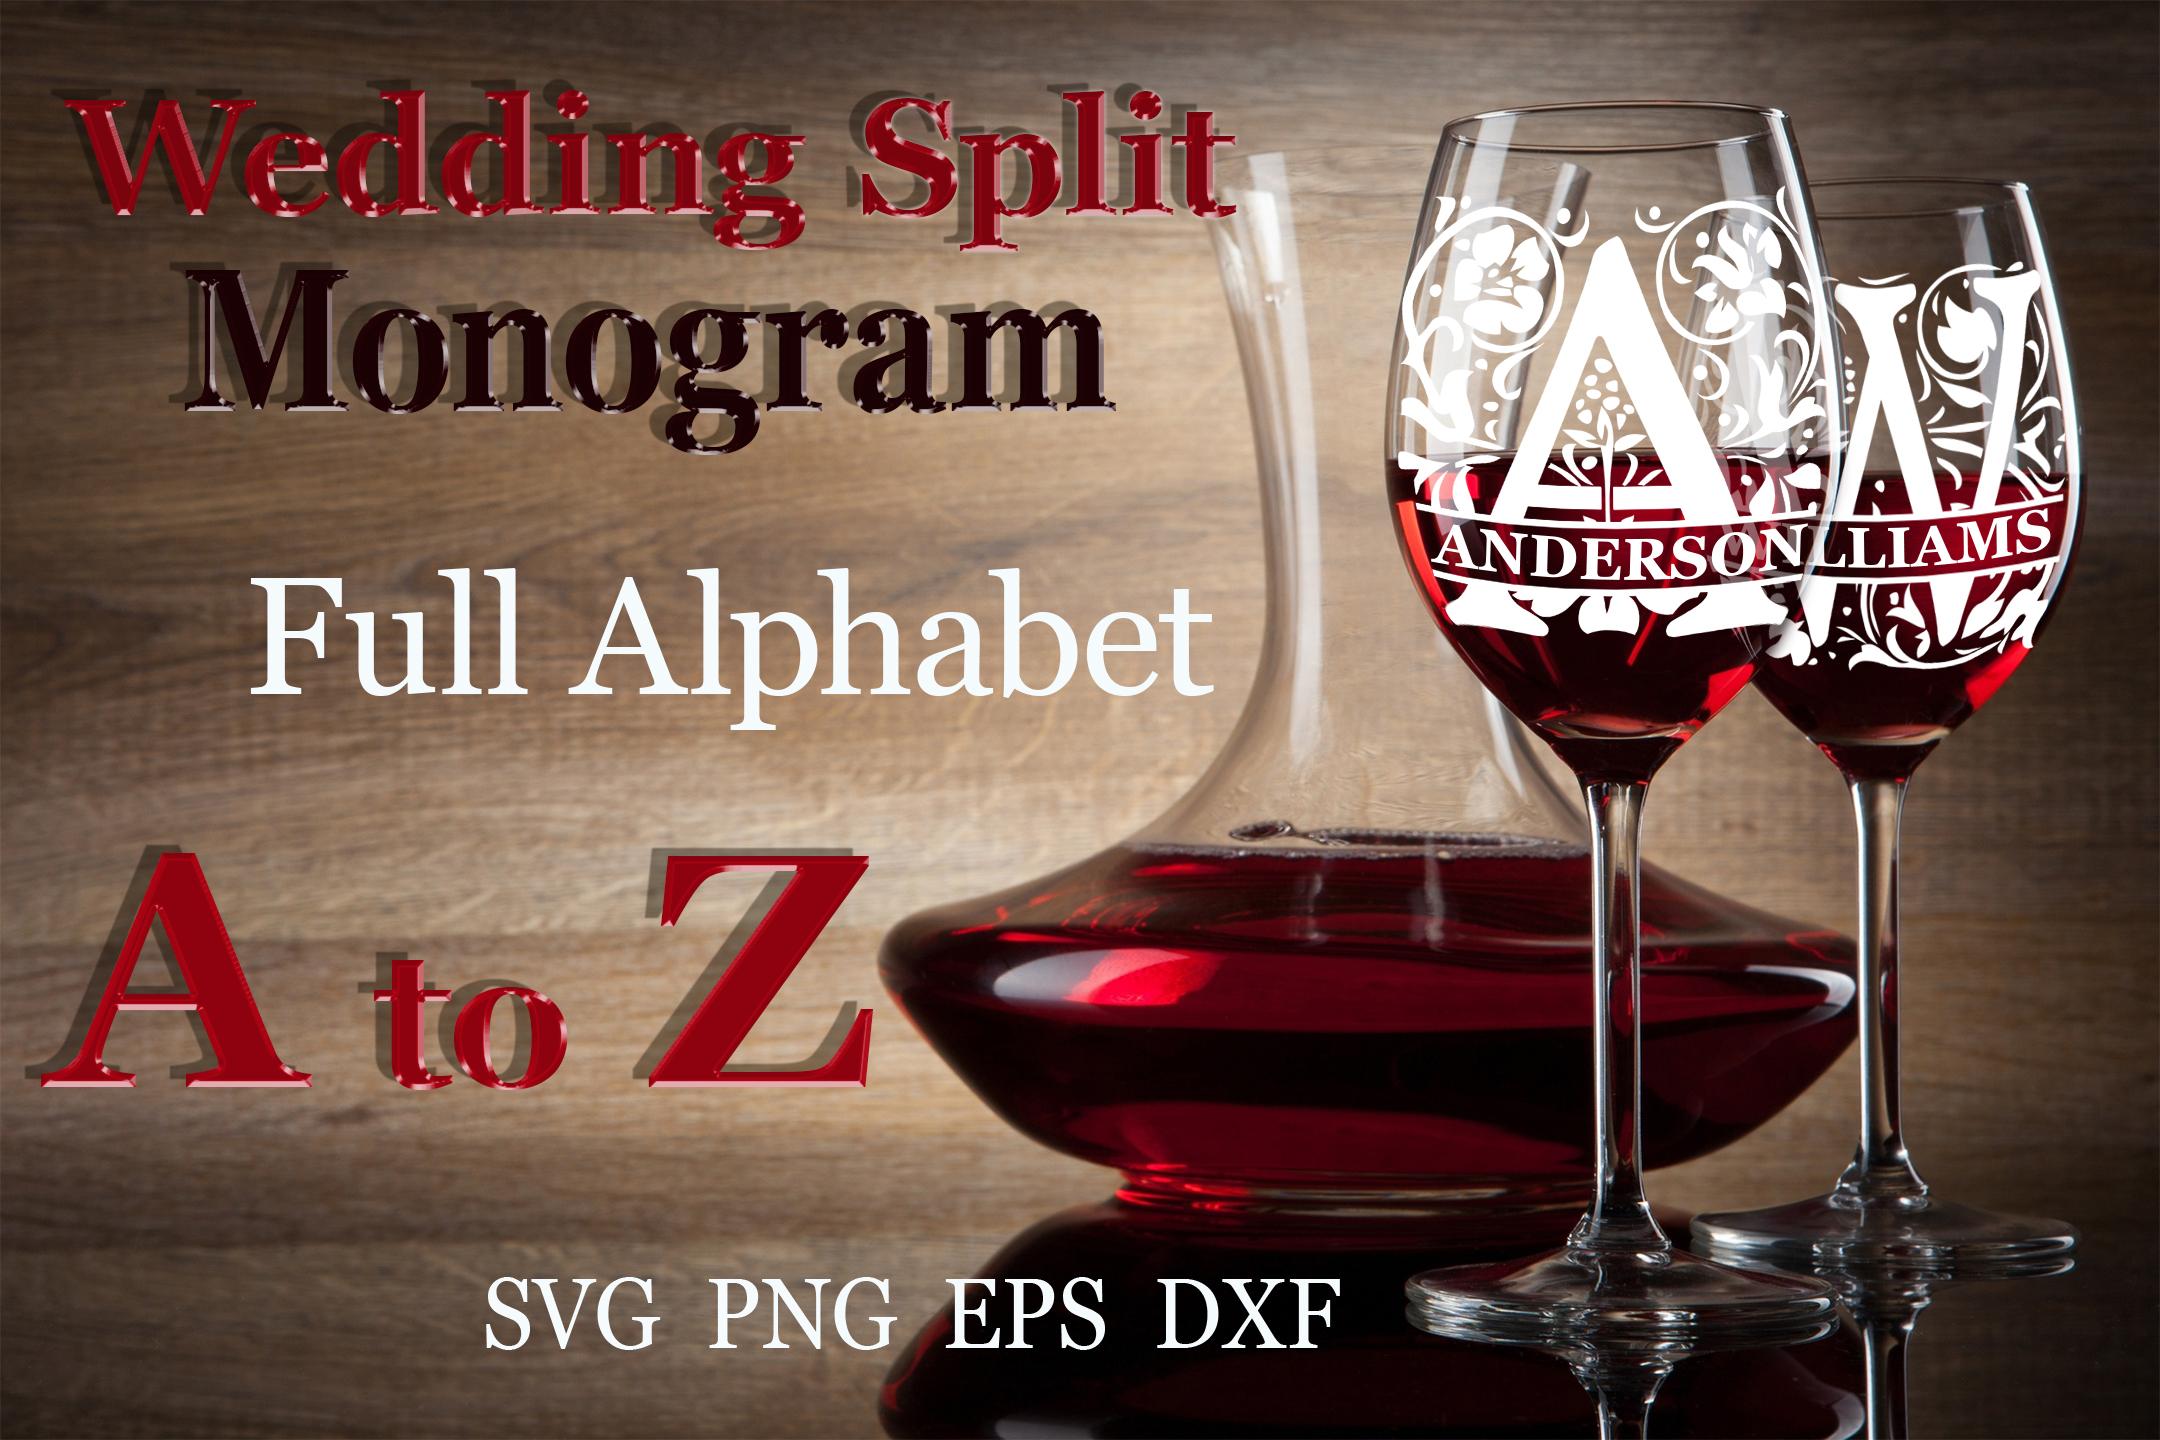 26 Wedding split monogram Wedding font SVG Engagement svg example image 1